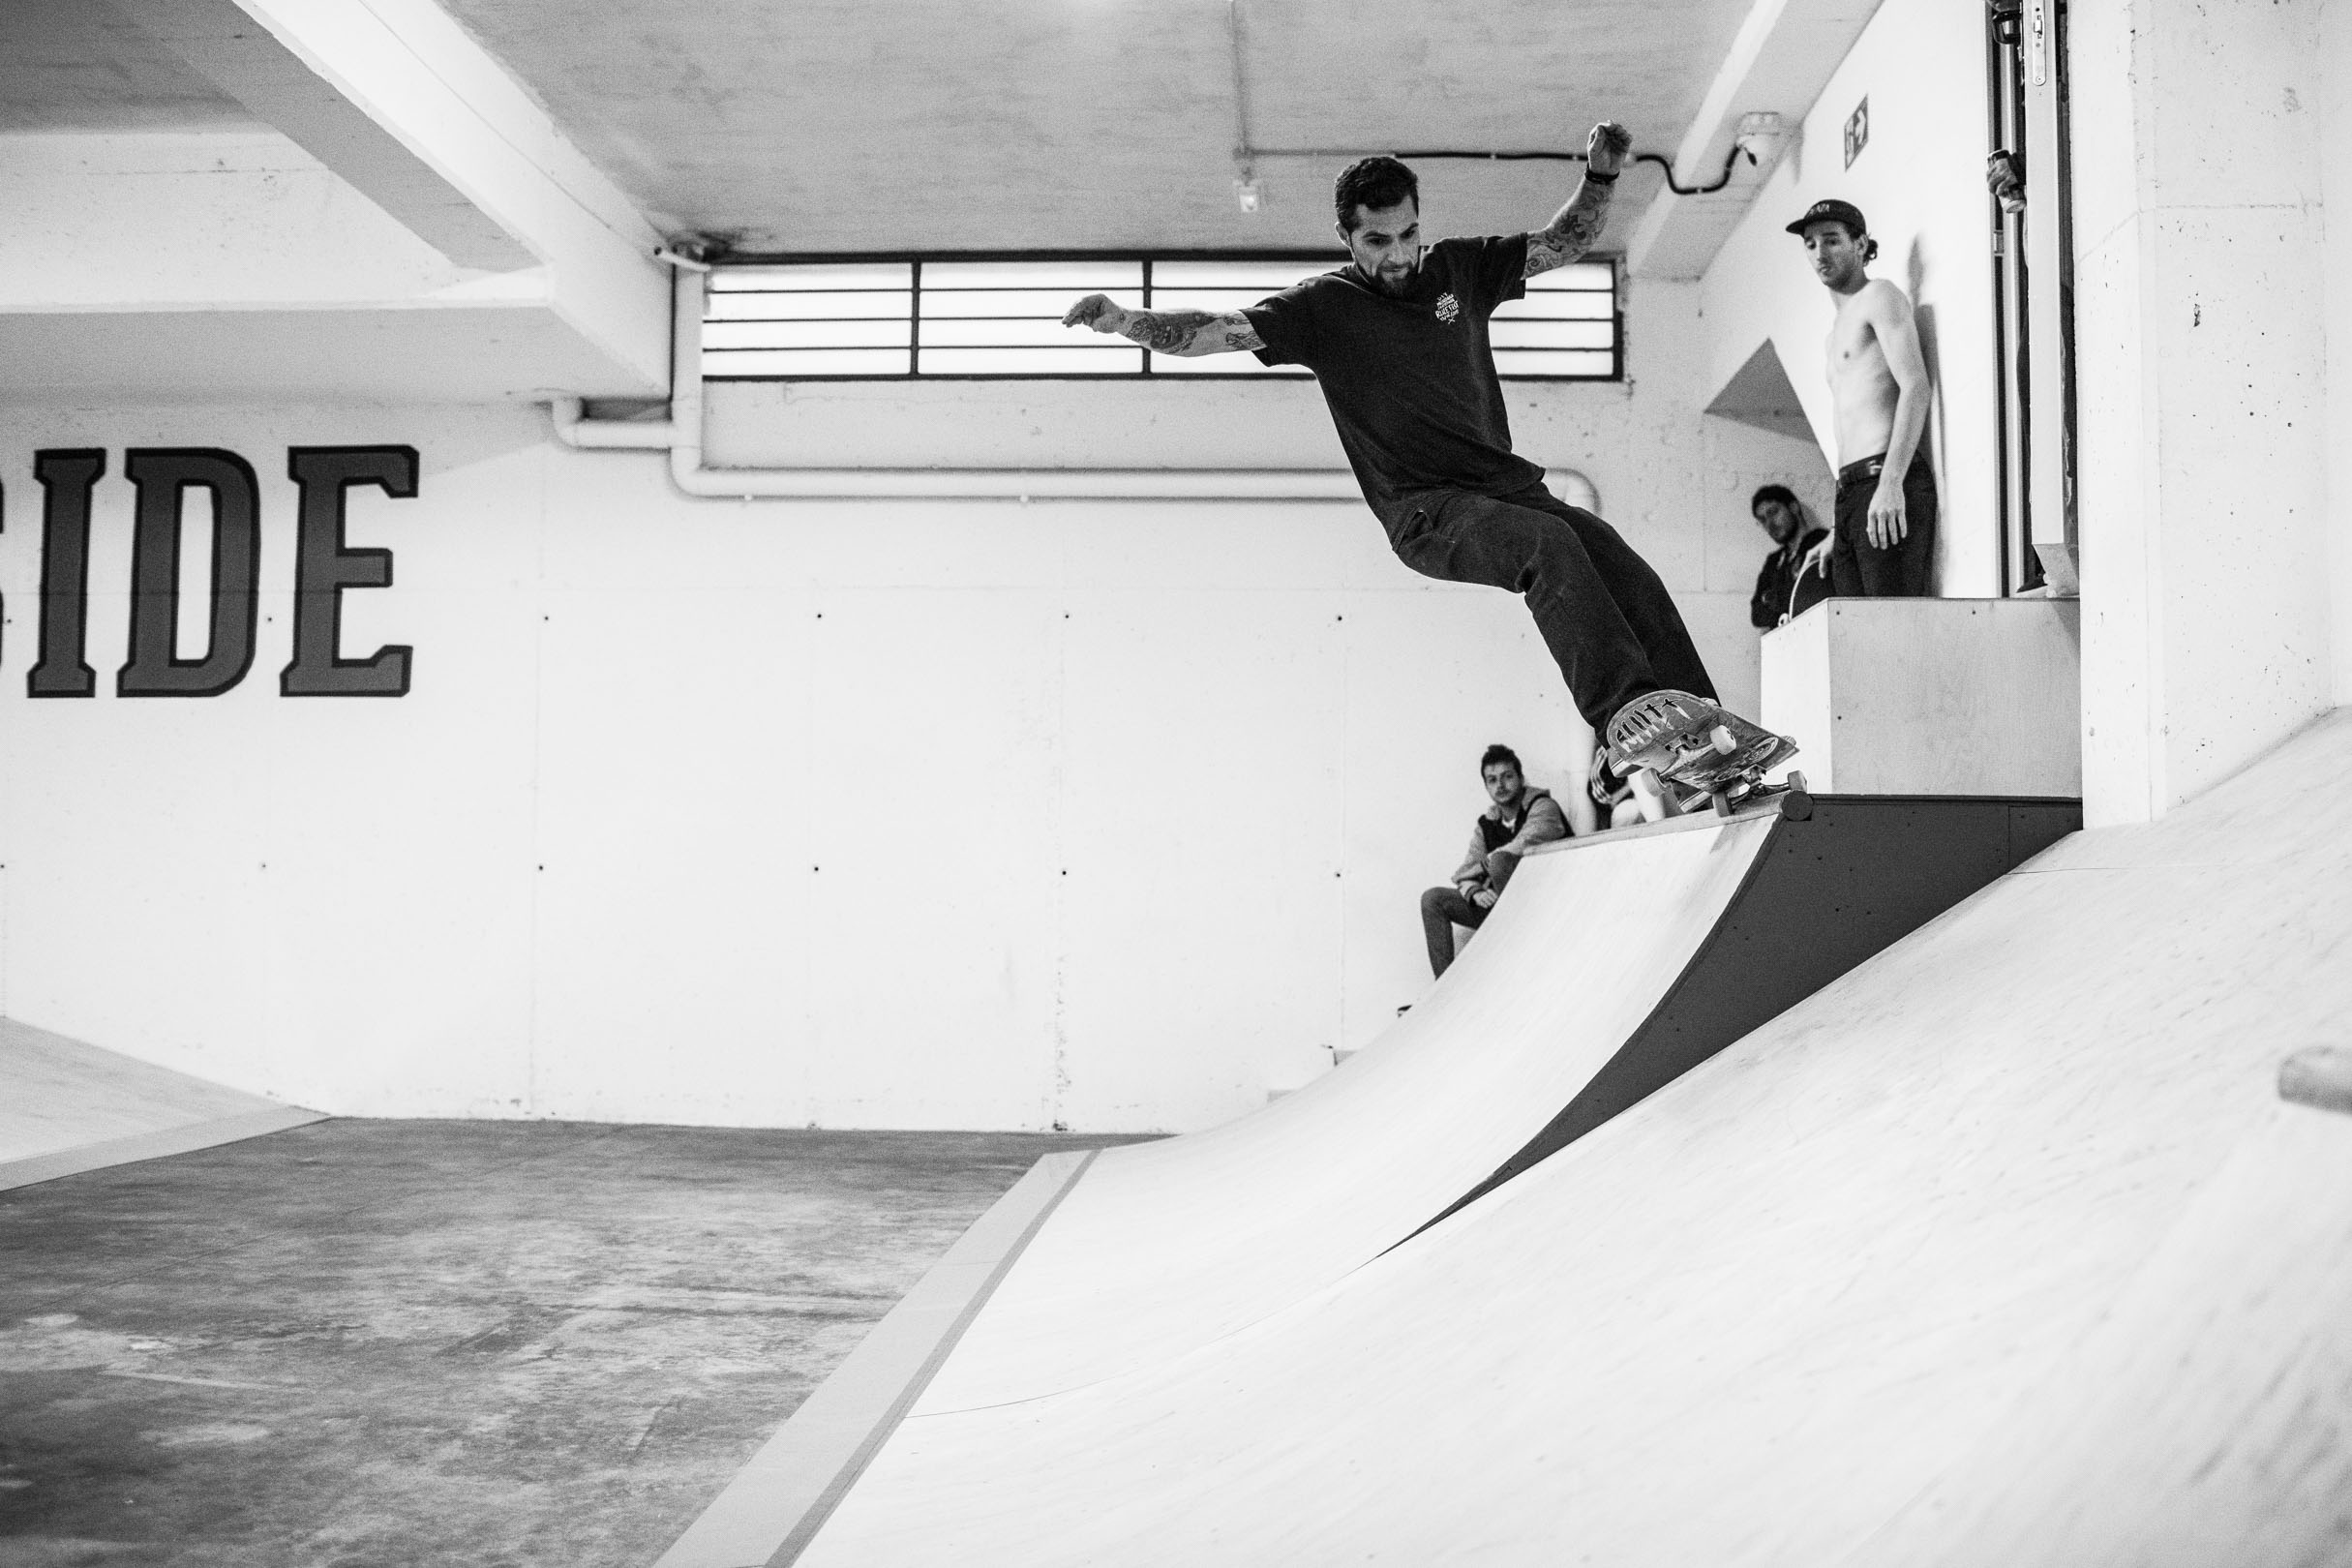 coruna-fotografia-skate-14.jpg